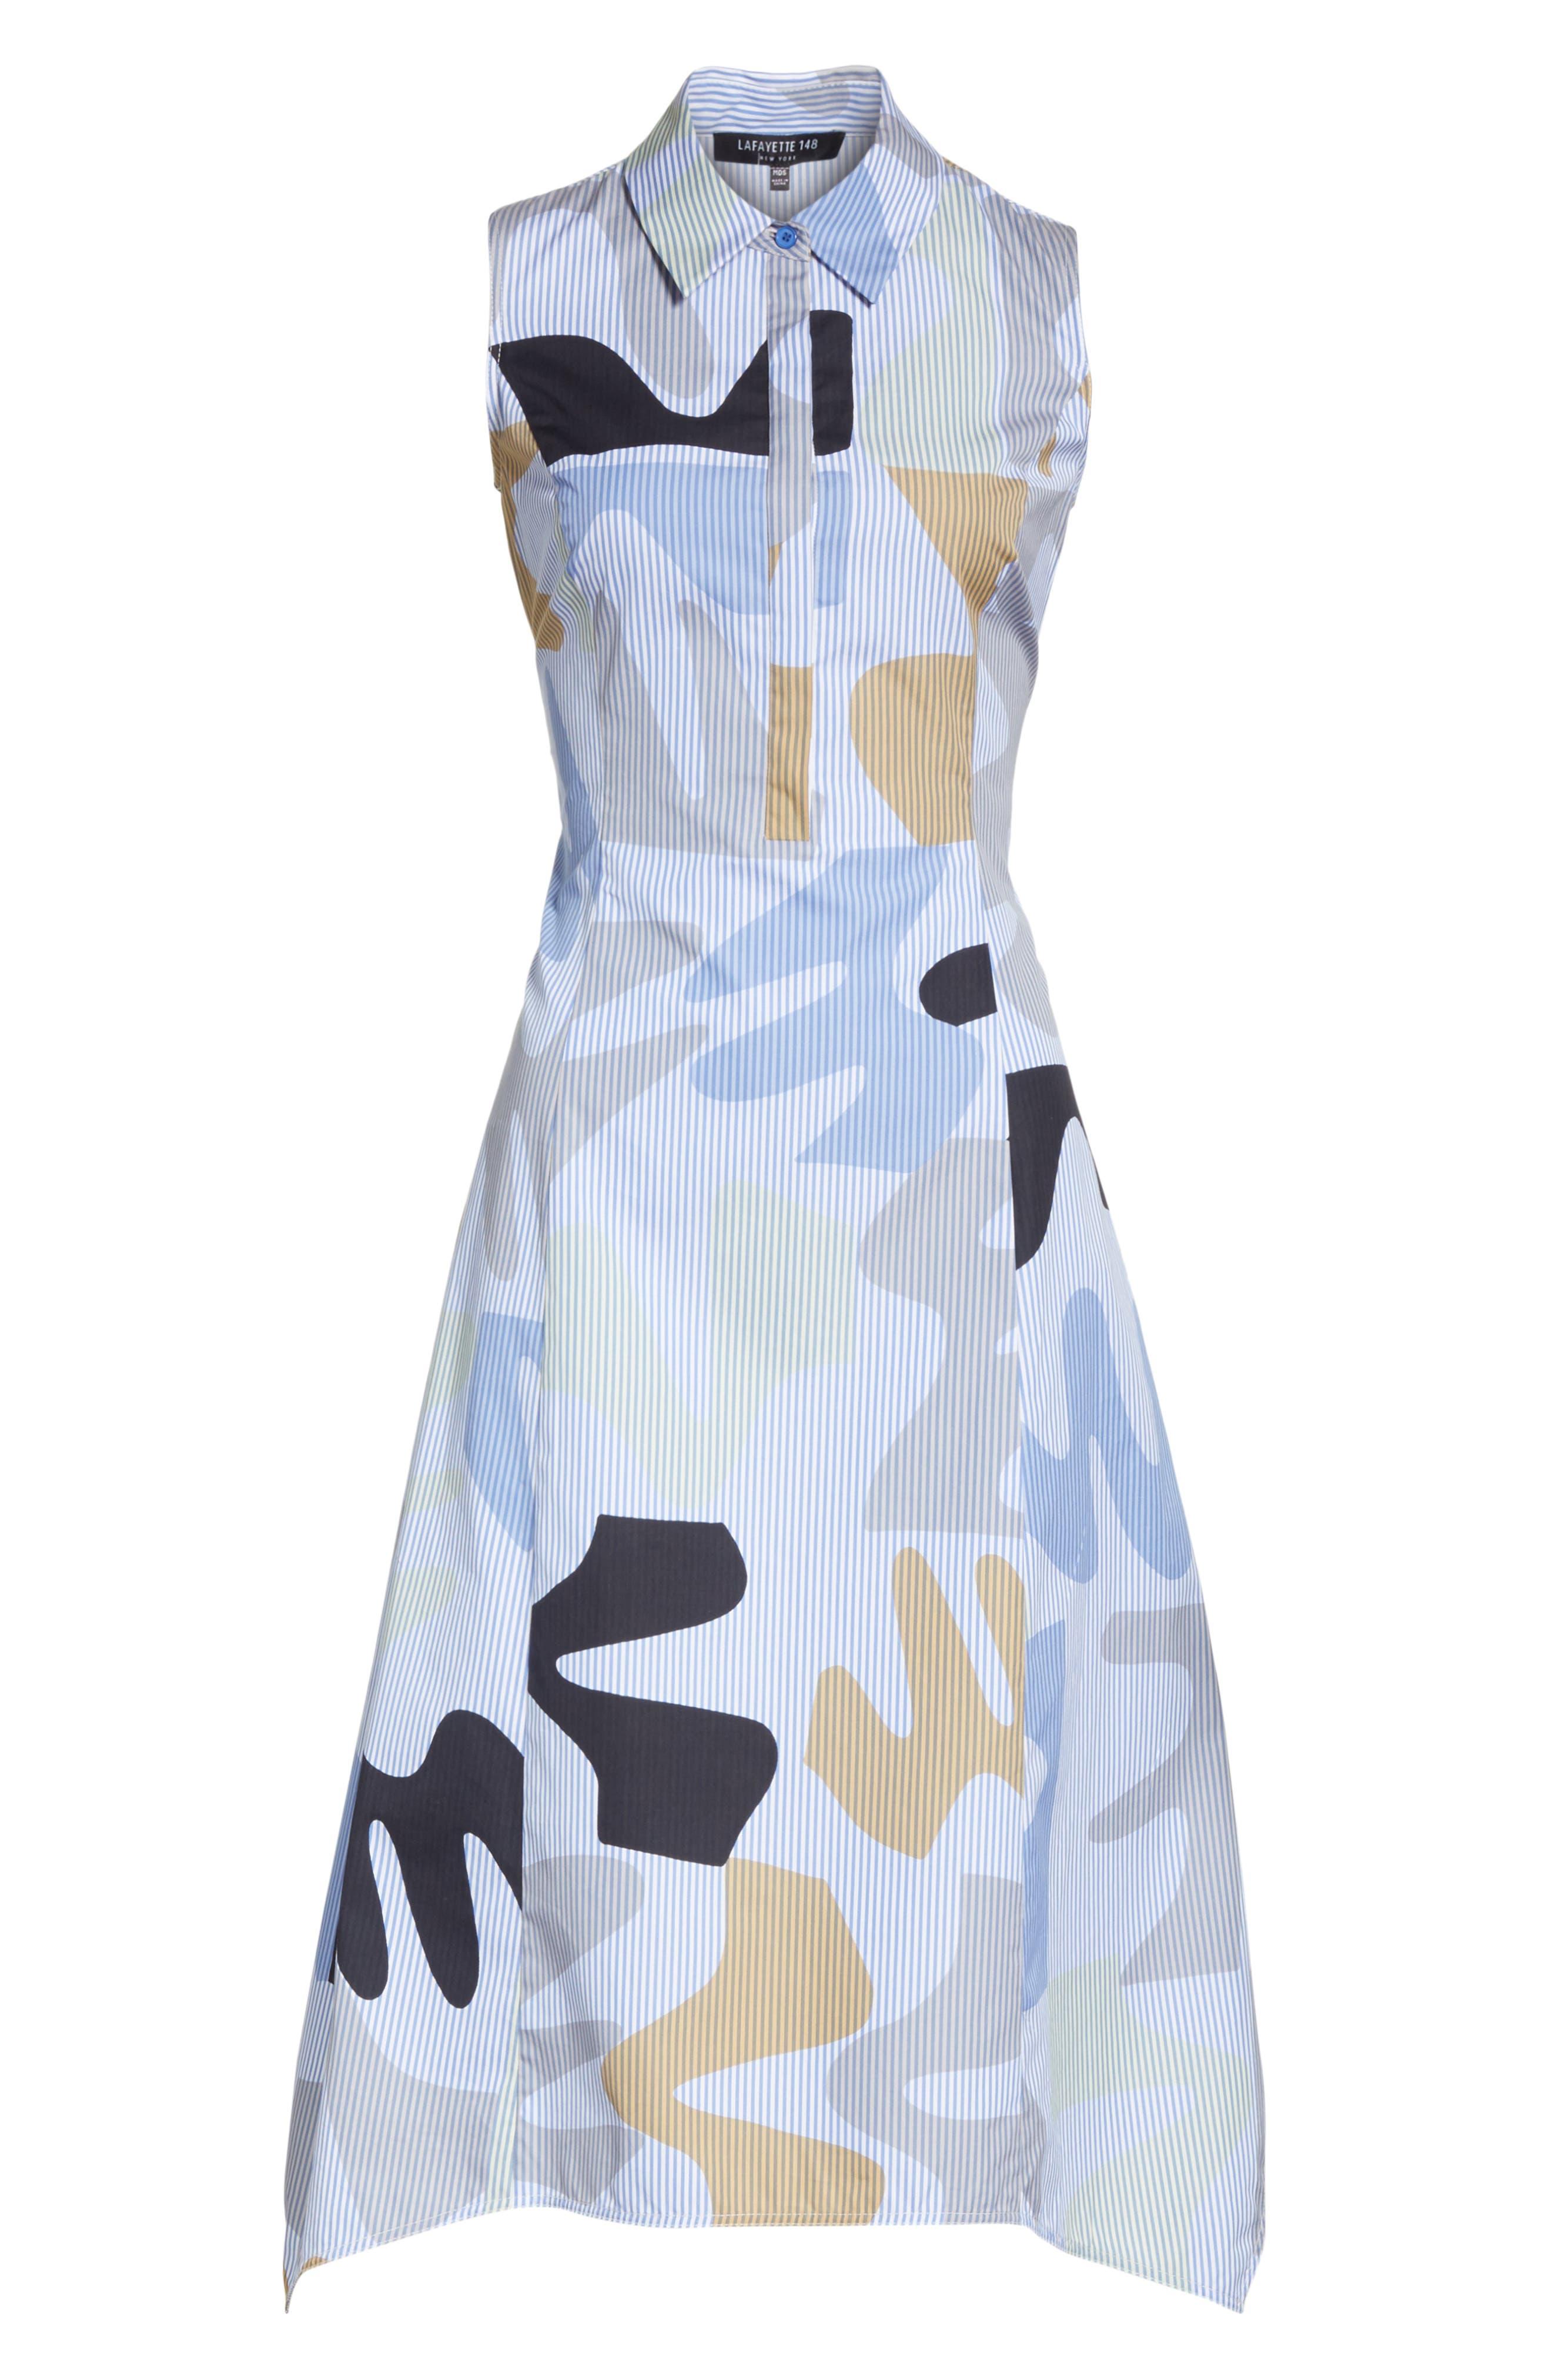 Cordelia Urban Ethos Stripe Dress,                             Alternate thumbnail 7, color,                             Periwinkle Multi